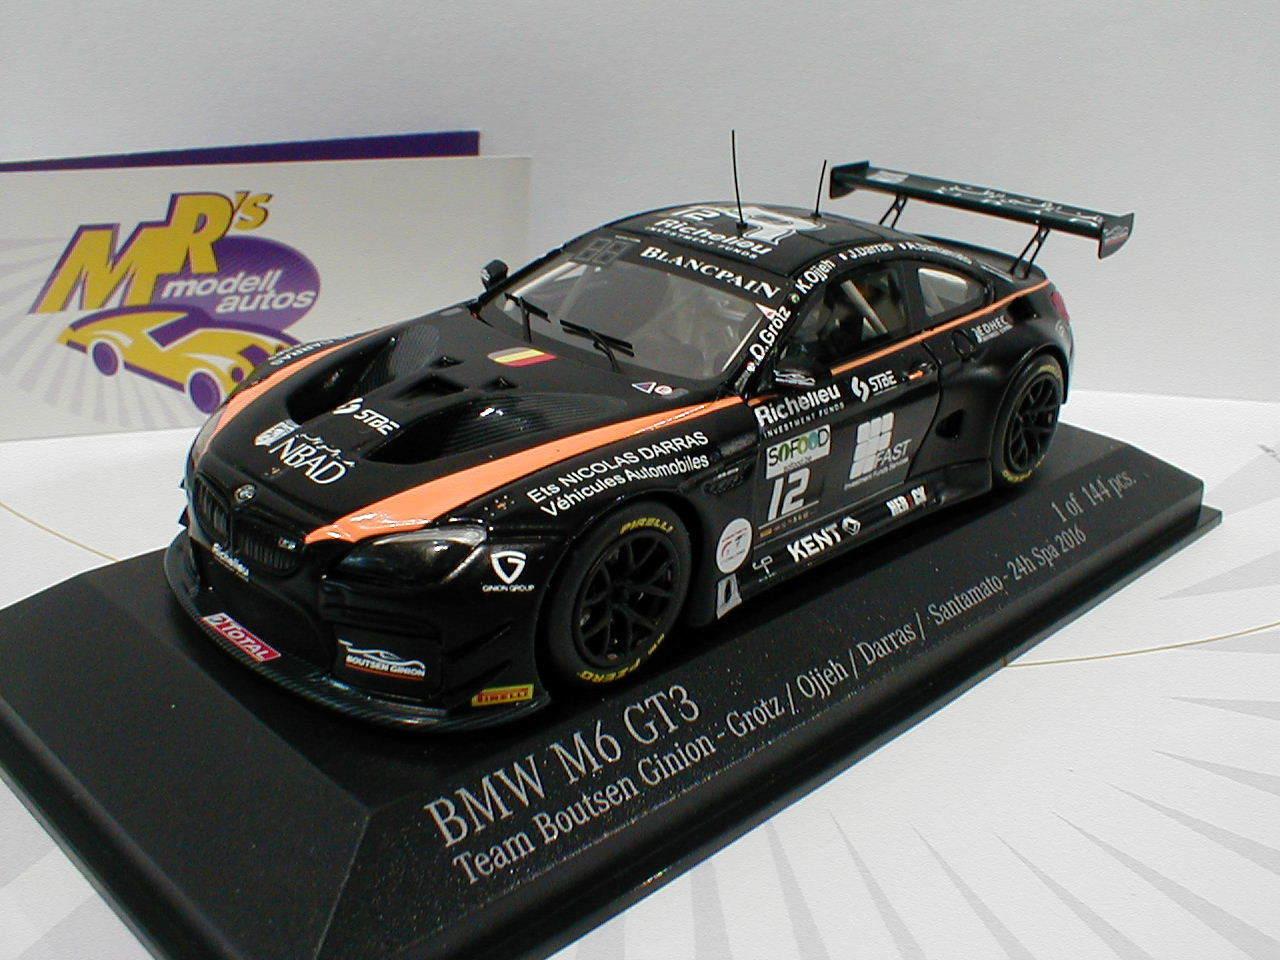 MINICHAMPS 437162612-BMW m6 gt3 No. 12 12 12 24 H. Spa 2016 équipe Boutsen Ginion 1 43 01dfb2